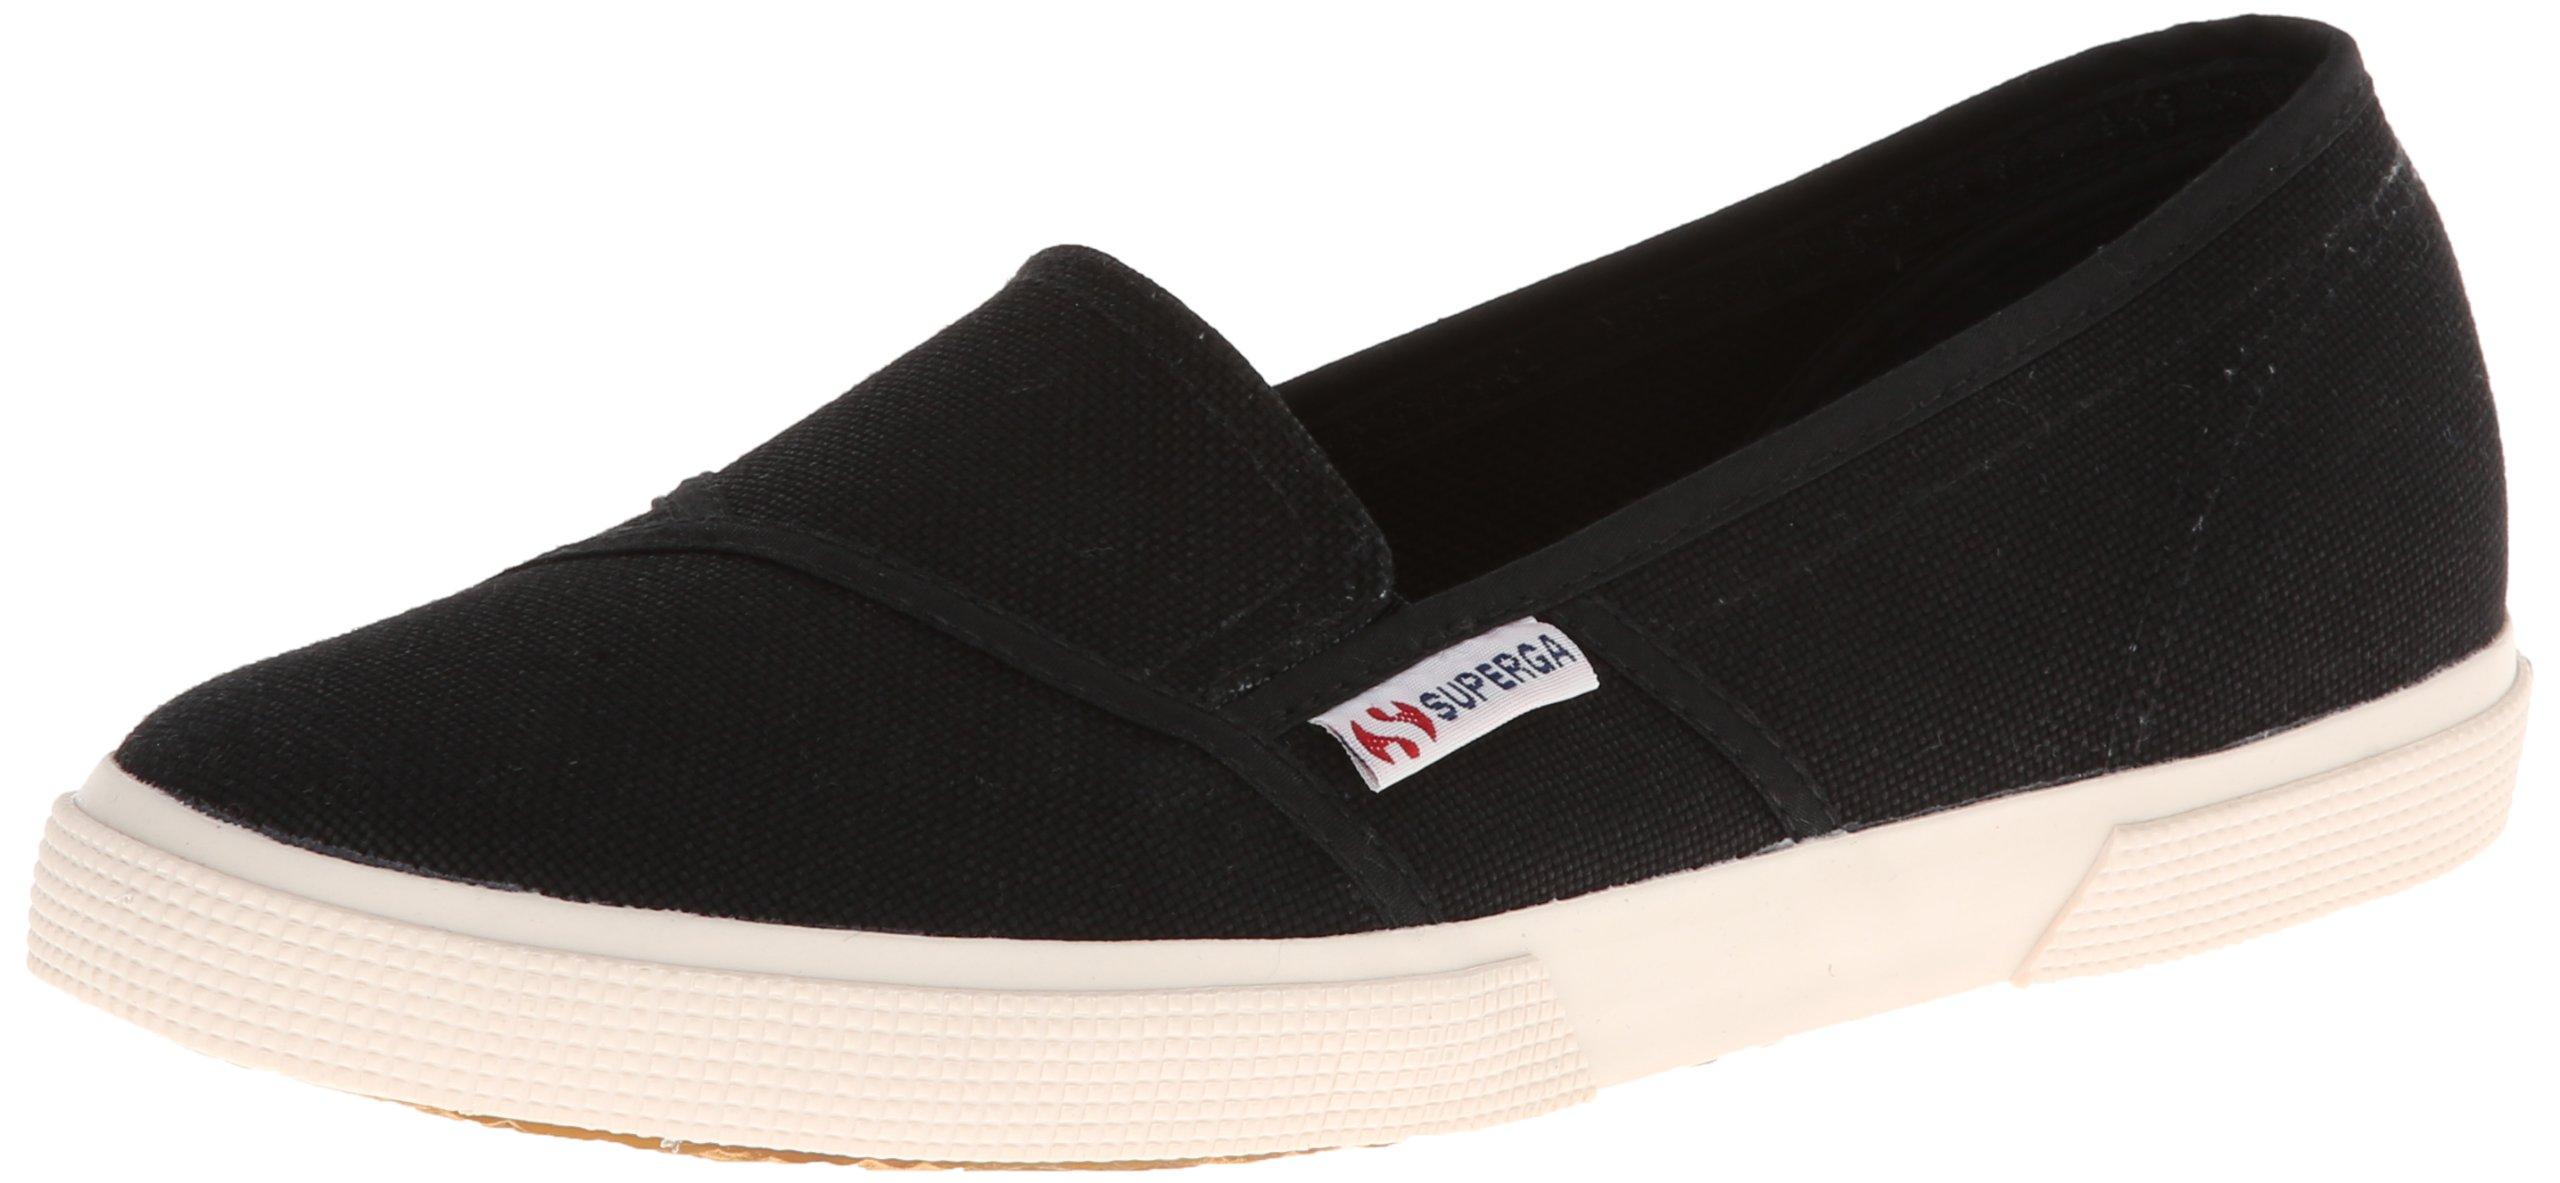 Superga Women's 2210 Cotu Fashion Sneaker, Black, 41 EU/9.5 M US